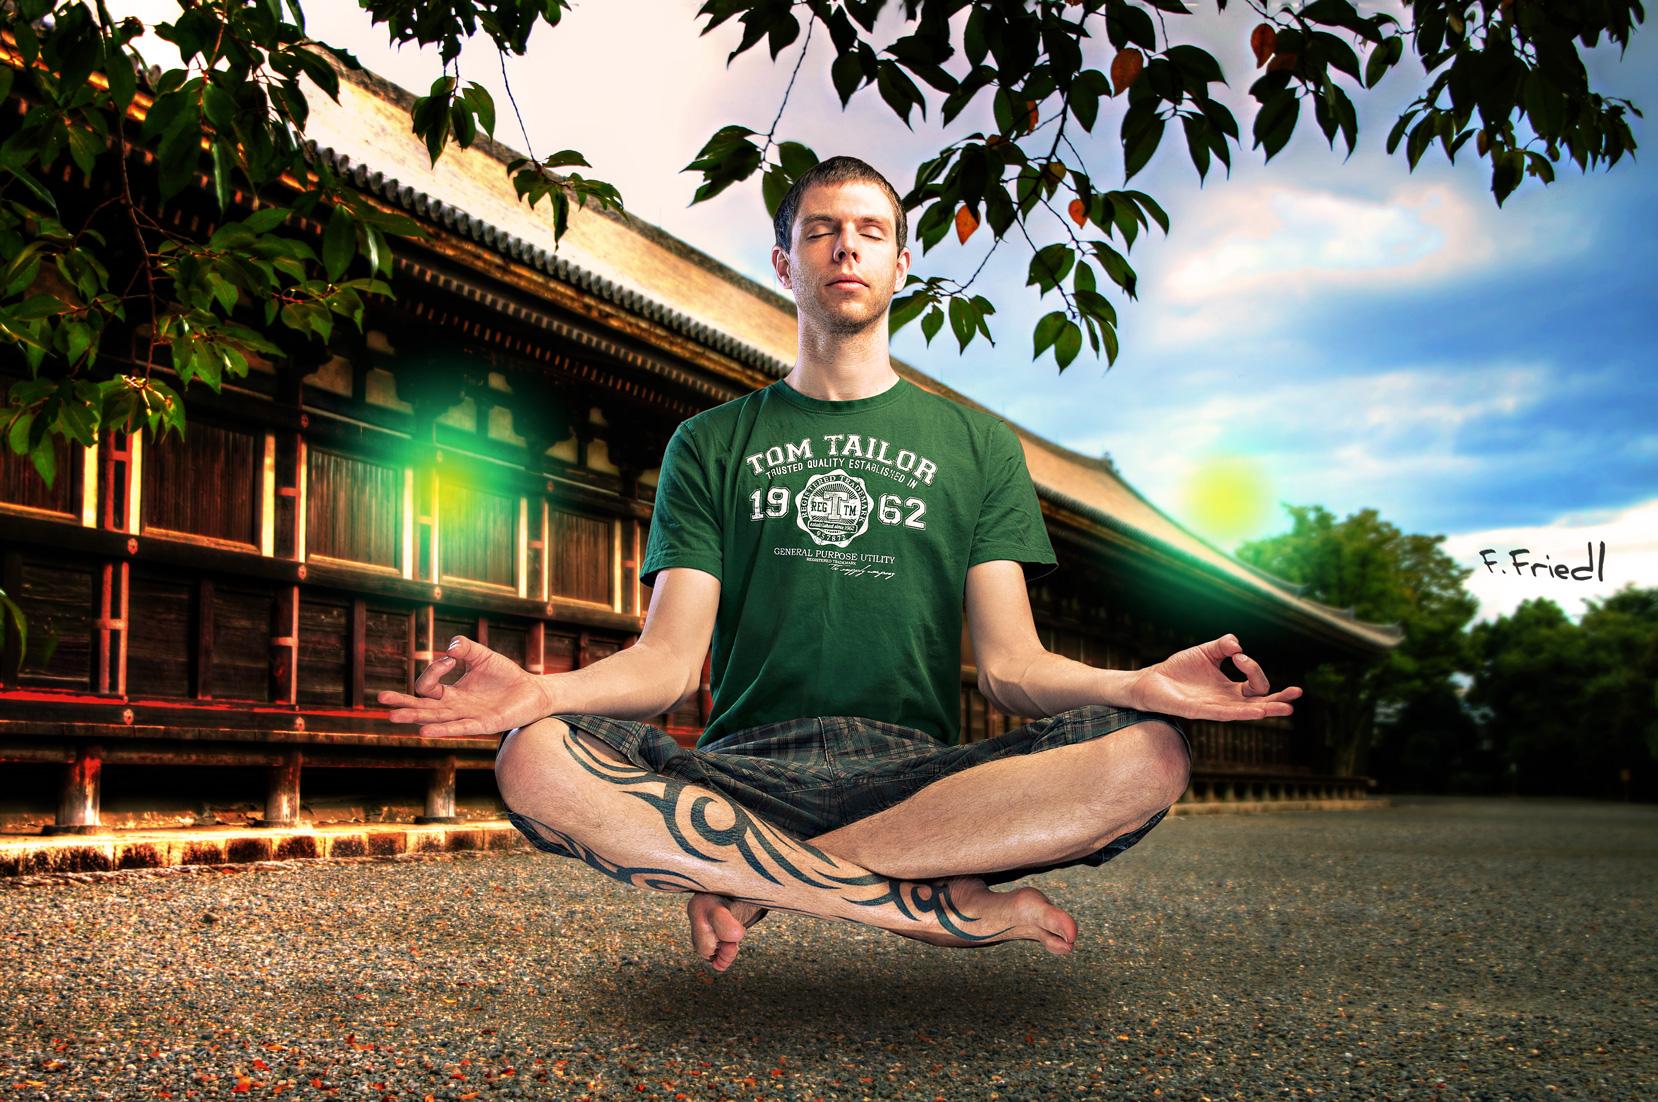 Week 14 - Meditation